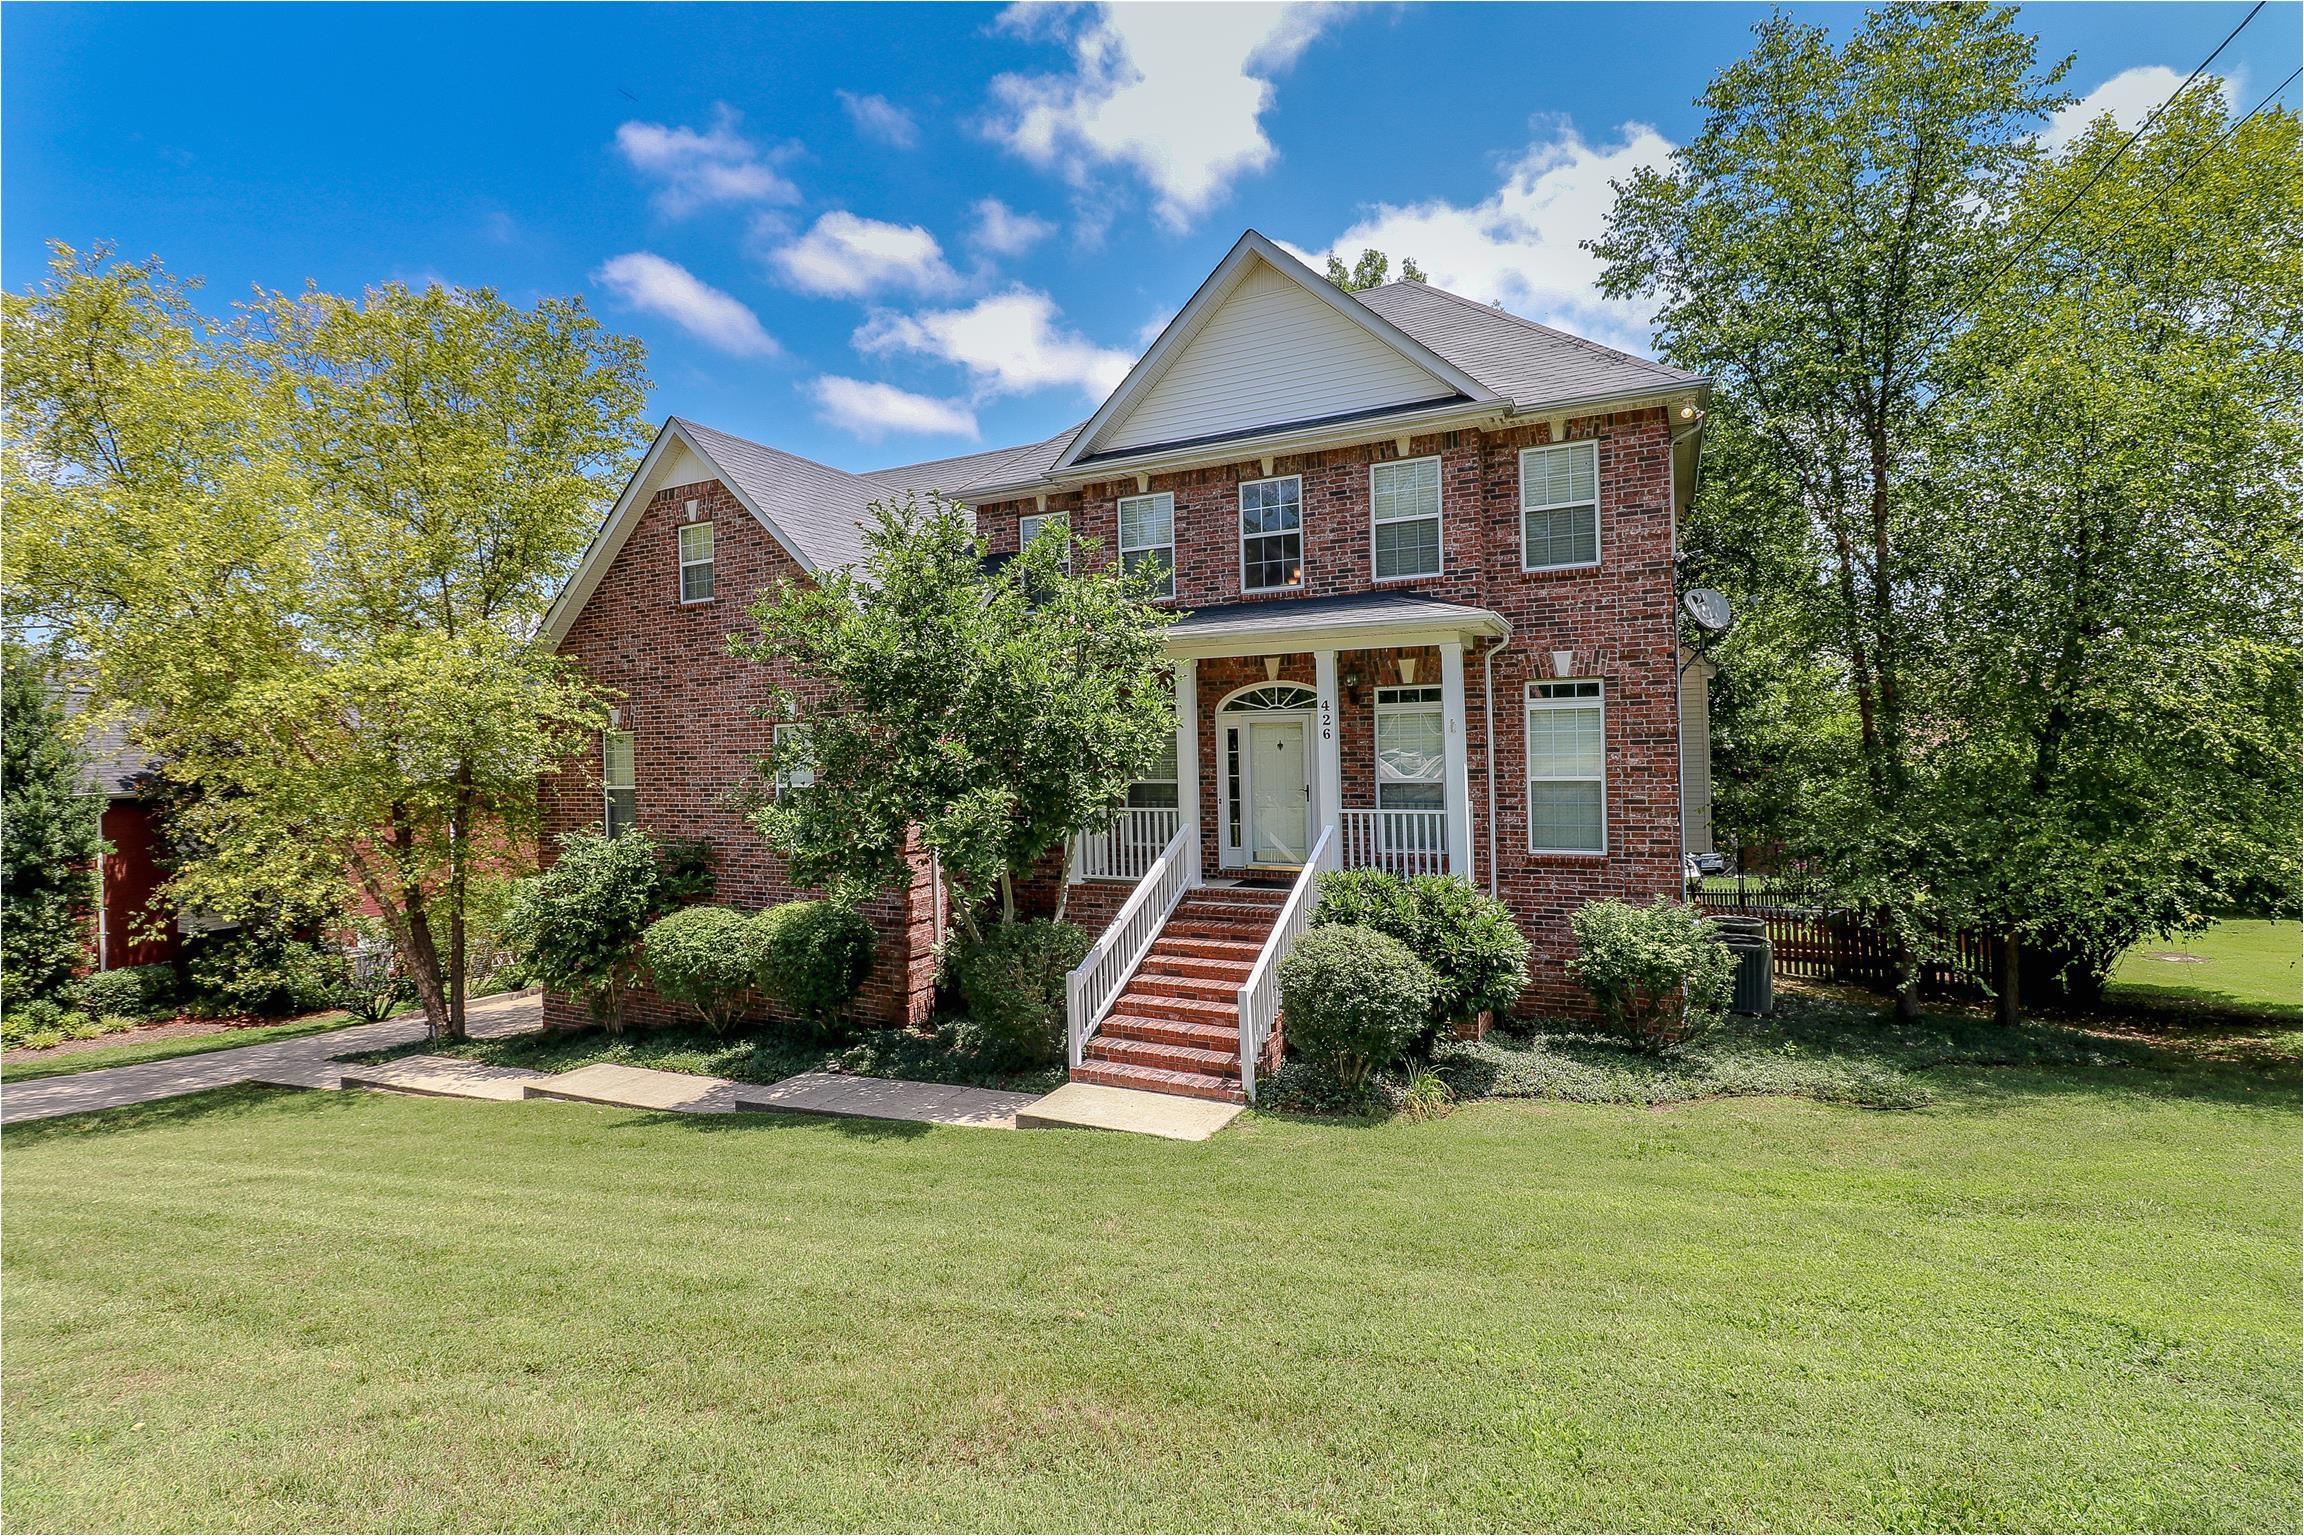 Homes for Sale In Smyrna Tn 426 Westwood Dr Smyrna Tn Mls 1945780